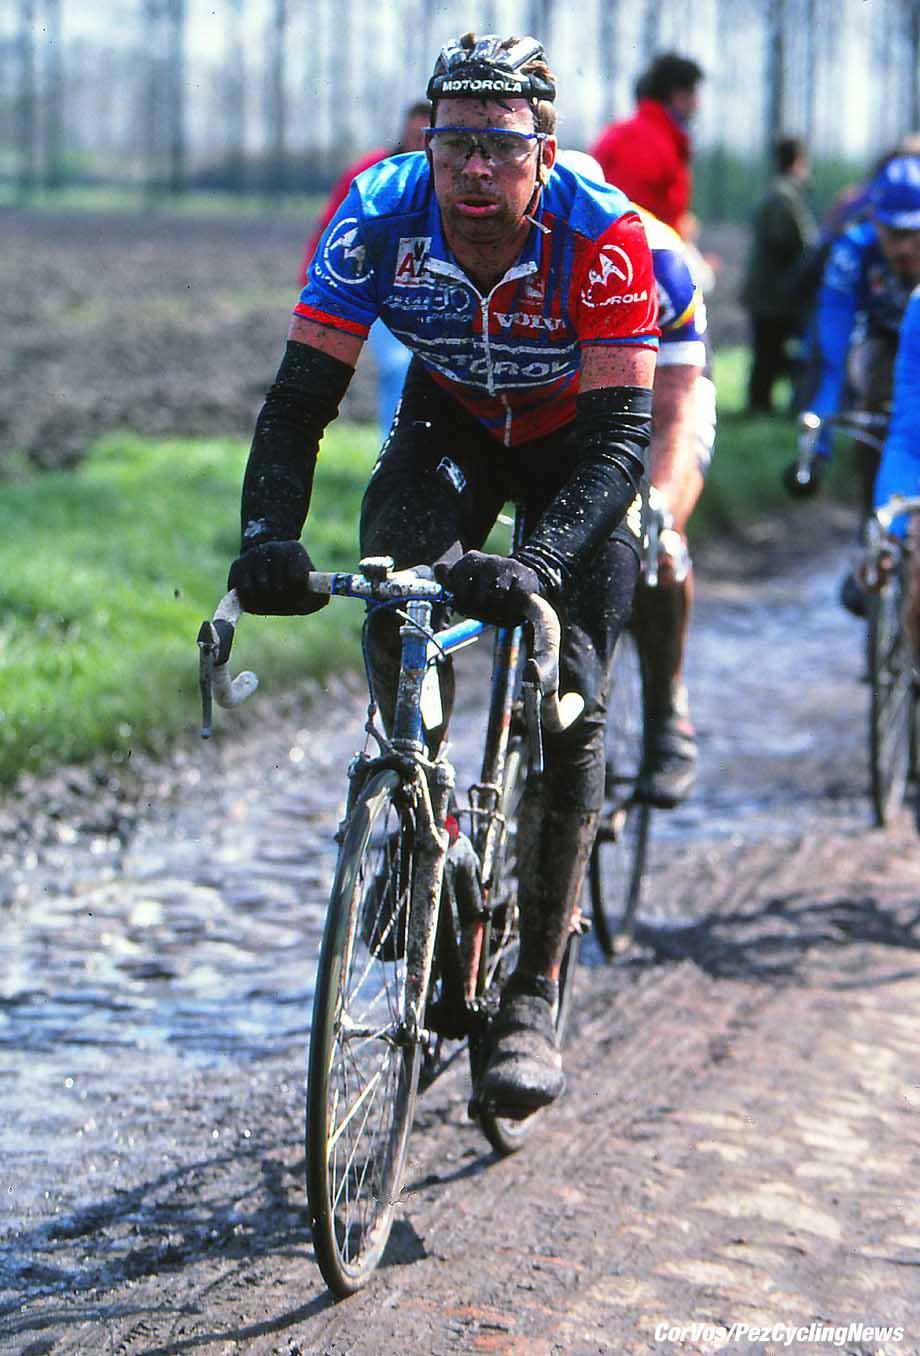 Roubaix - France  - wielrennen - cycling - cyclisme - radsport - Sean YATES  pictured during Paris-Roubaix 1994 - archief - stock - archive - archivbild -  photo Cor Vos © 2017